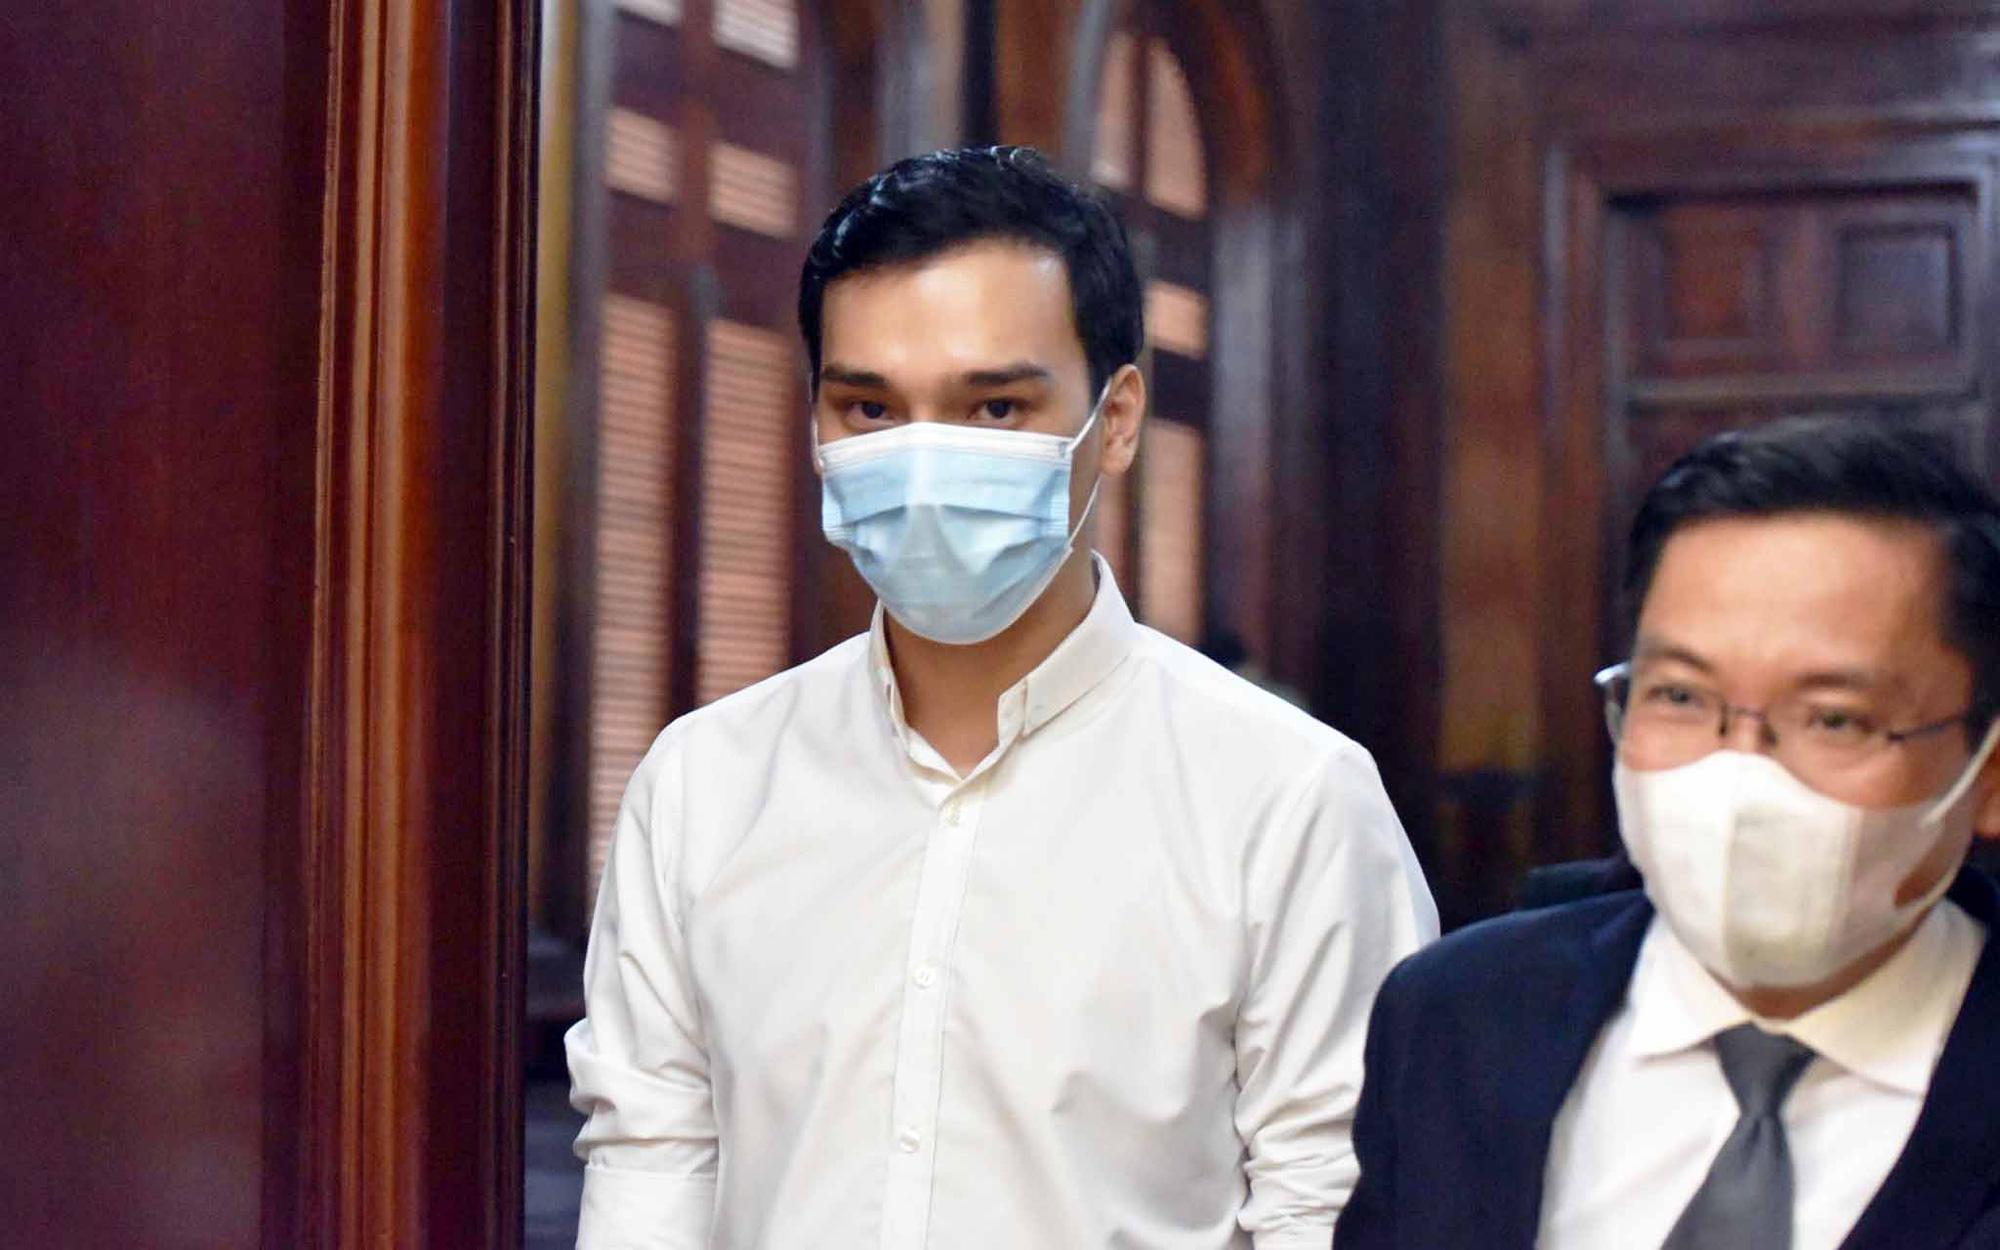 Vietnamese flight attendant receives suspended sentence for causing COVID-19 spread